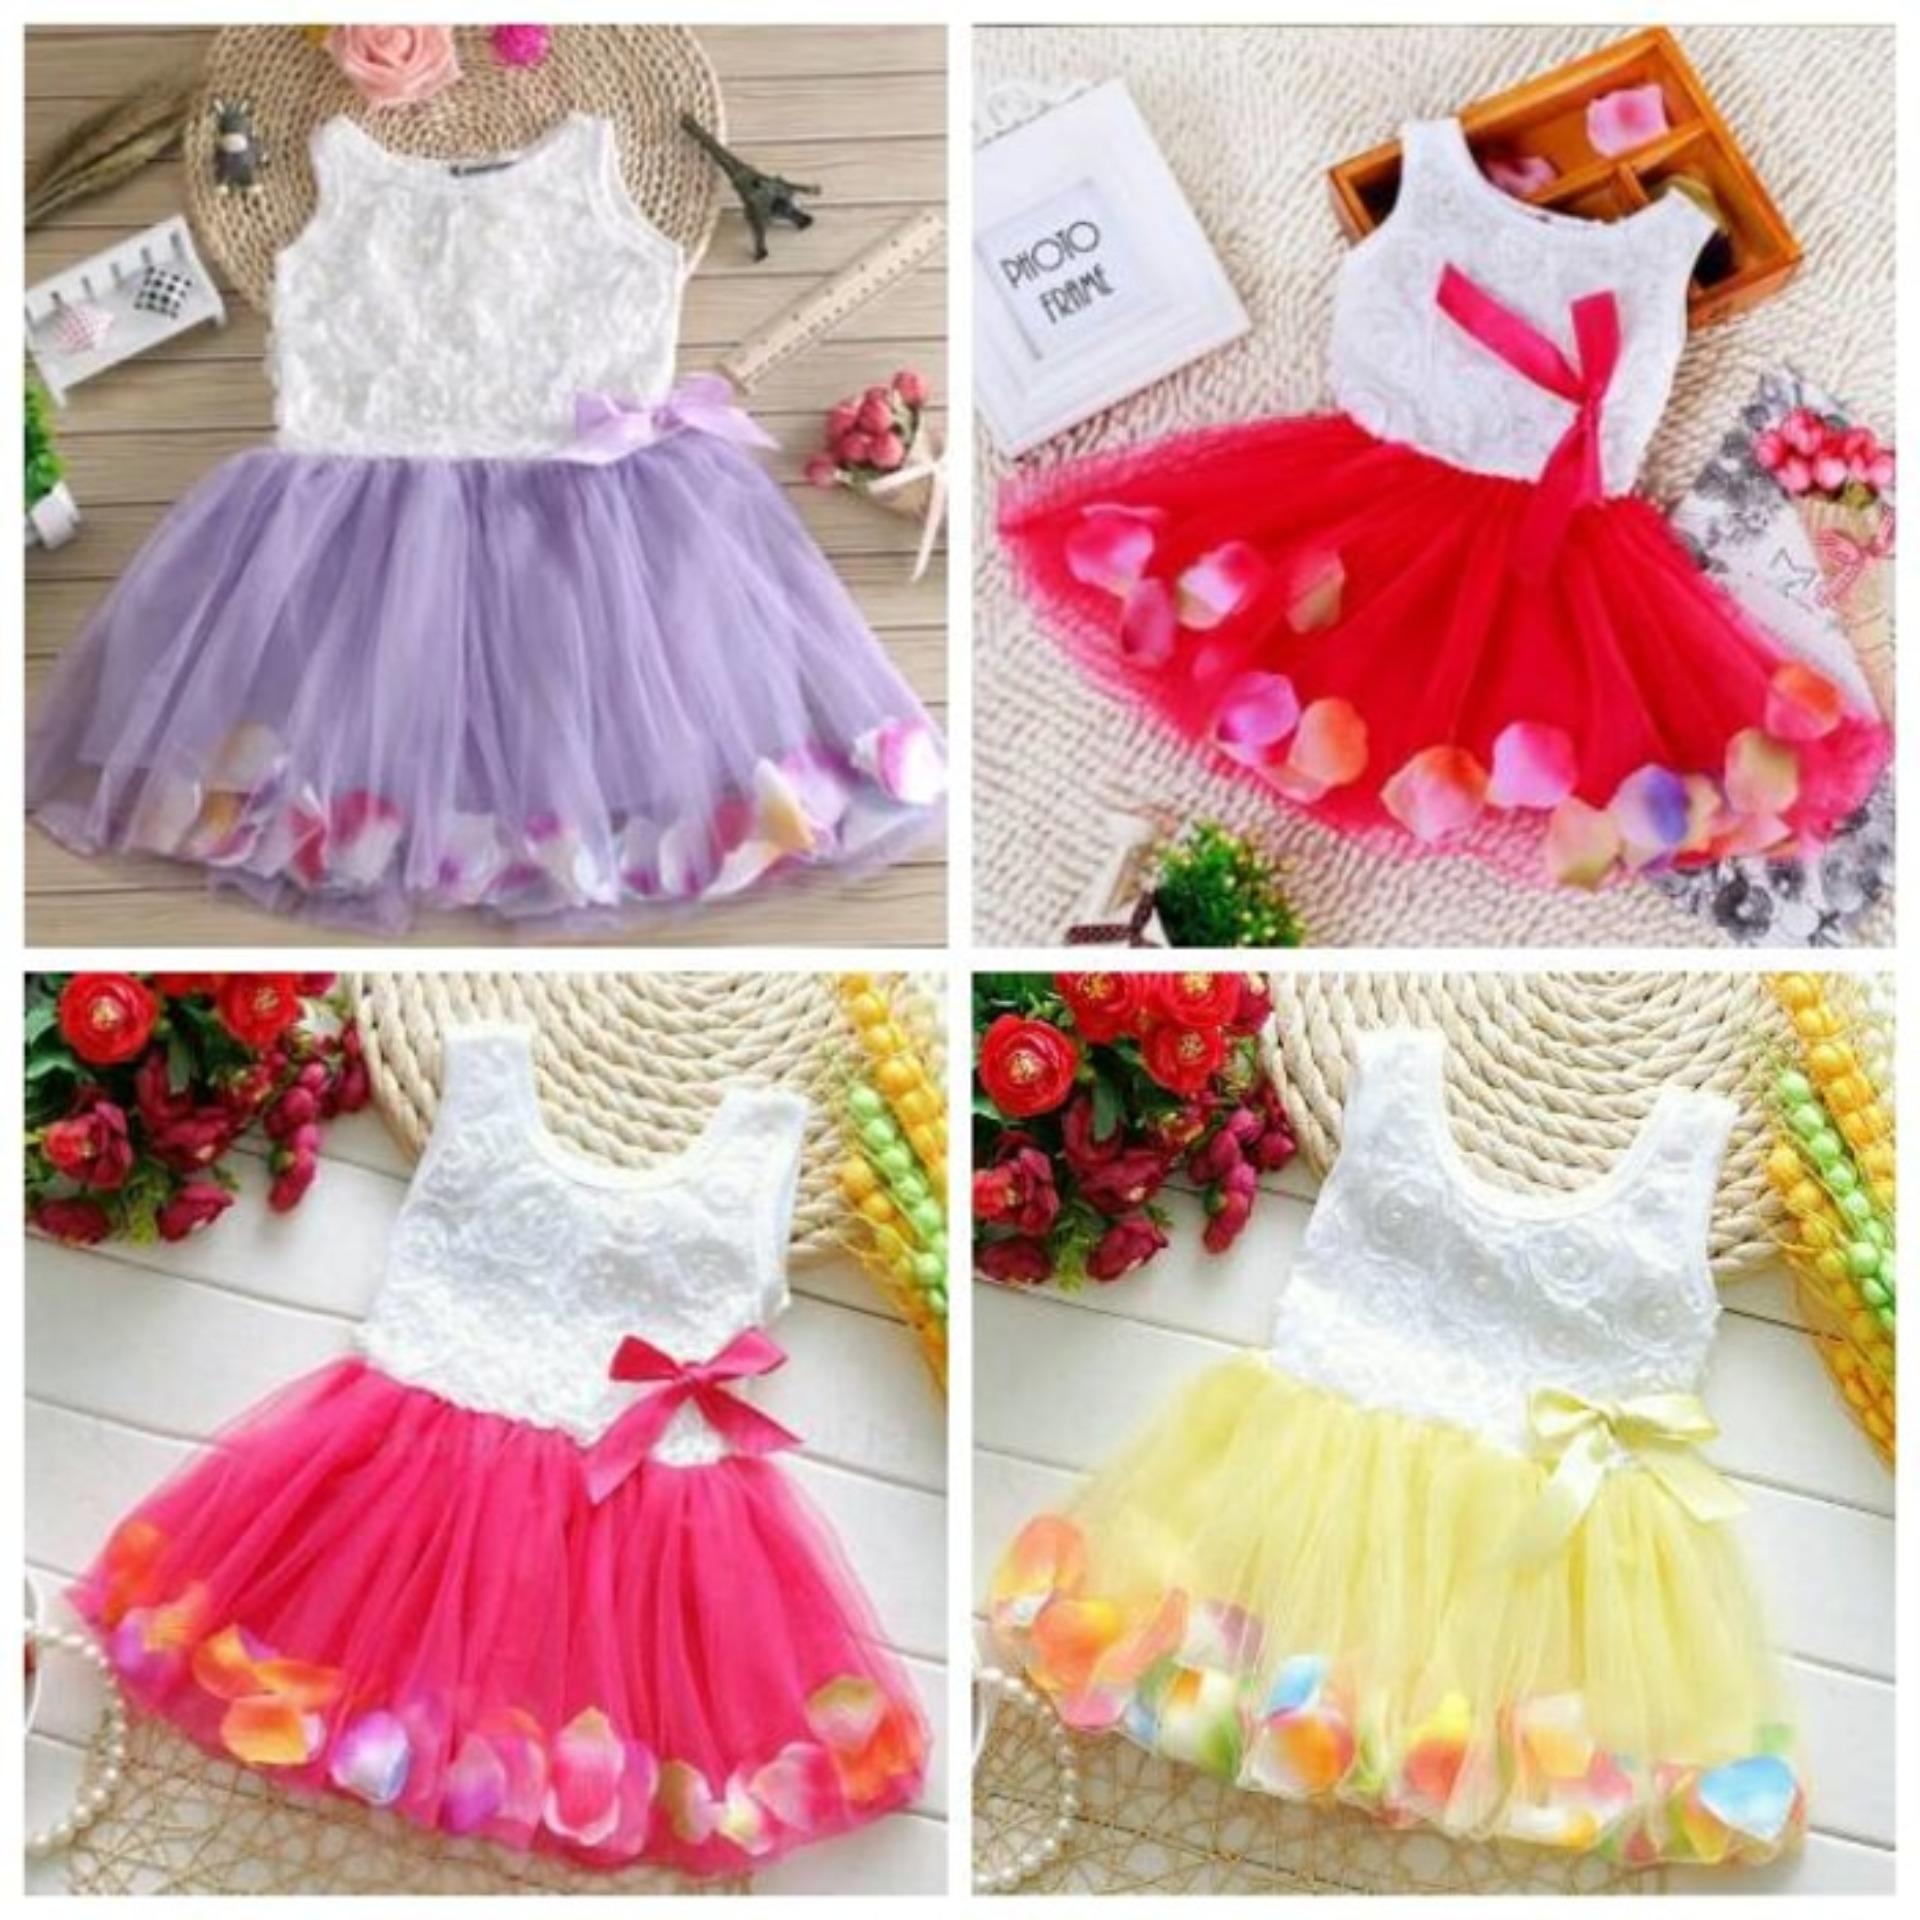 Harga Hemat Baju Gaun Pesta Bayi Anak Perempuan Gaun Anak Perempuan Gaun Pesta